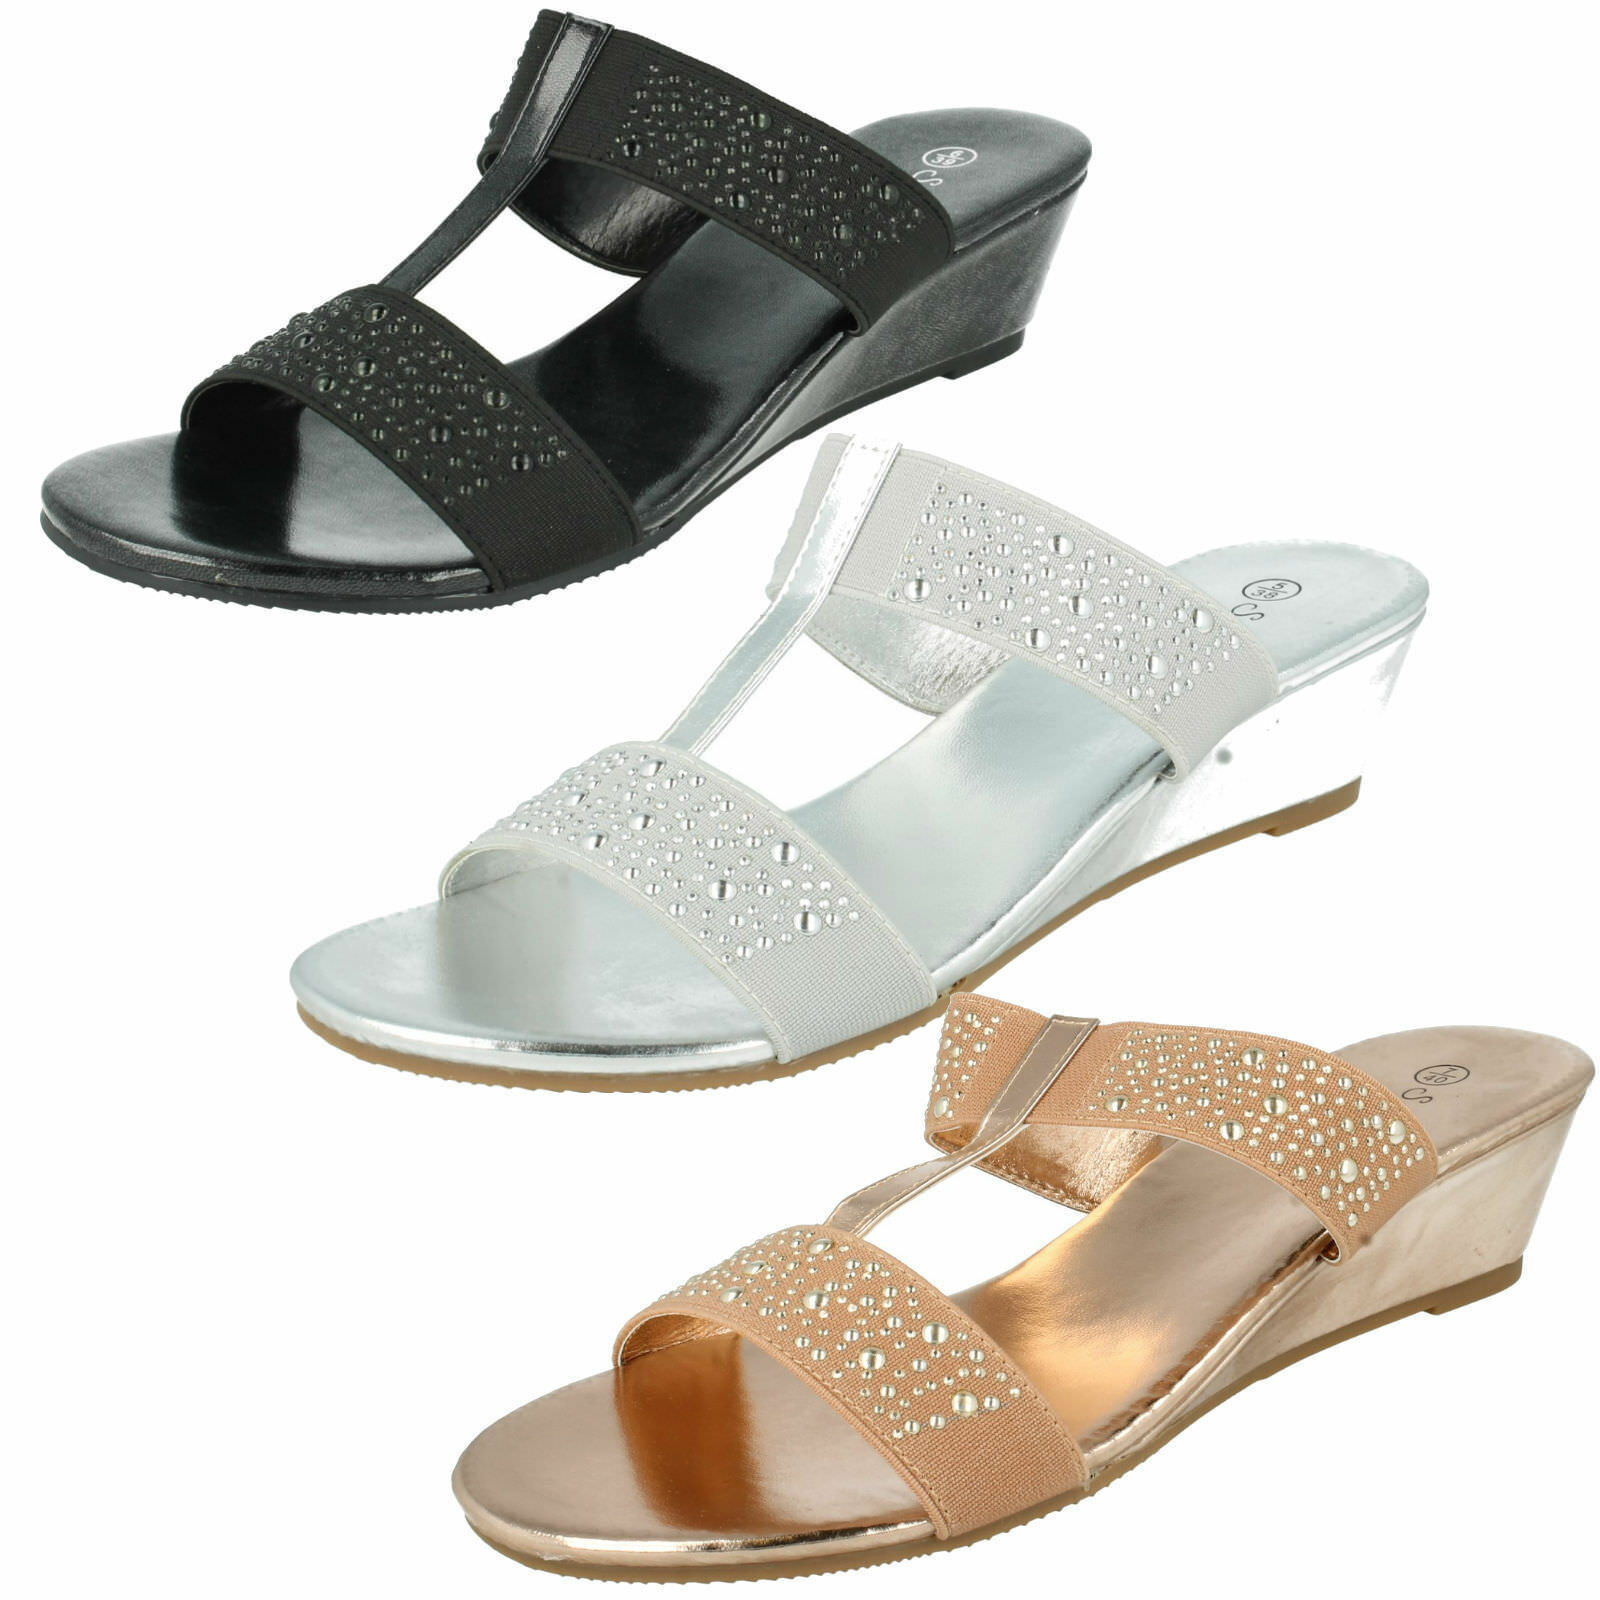 Savannah F10736 Summer Ladies Slip On Wedge Summer F10736 Sandals 471d70